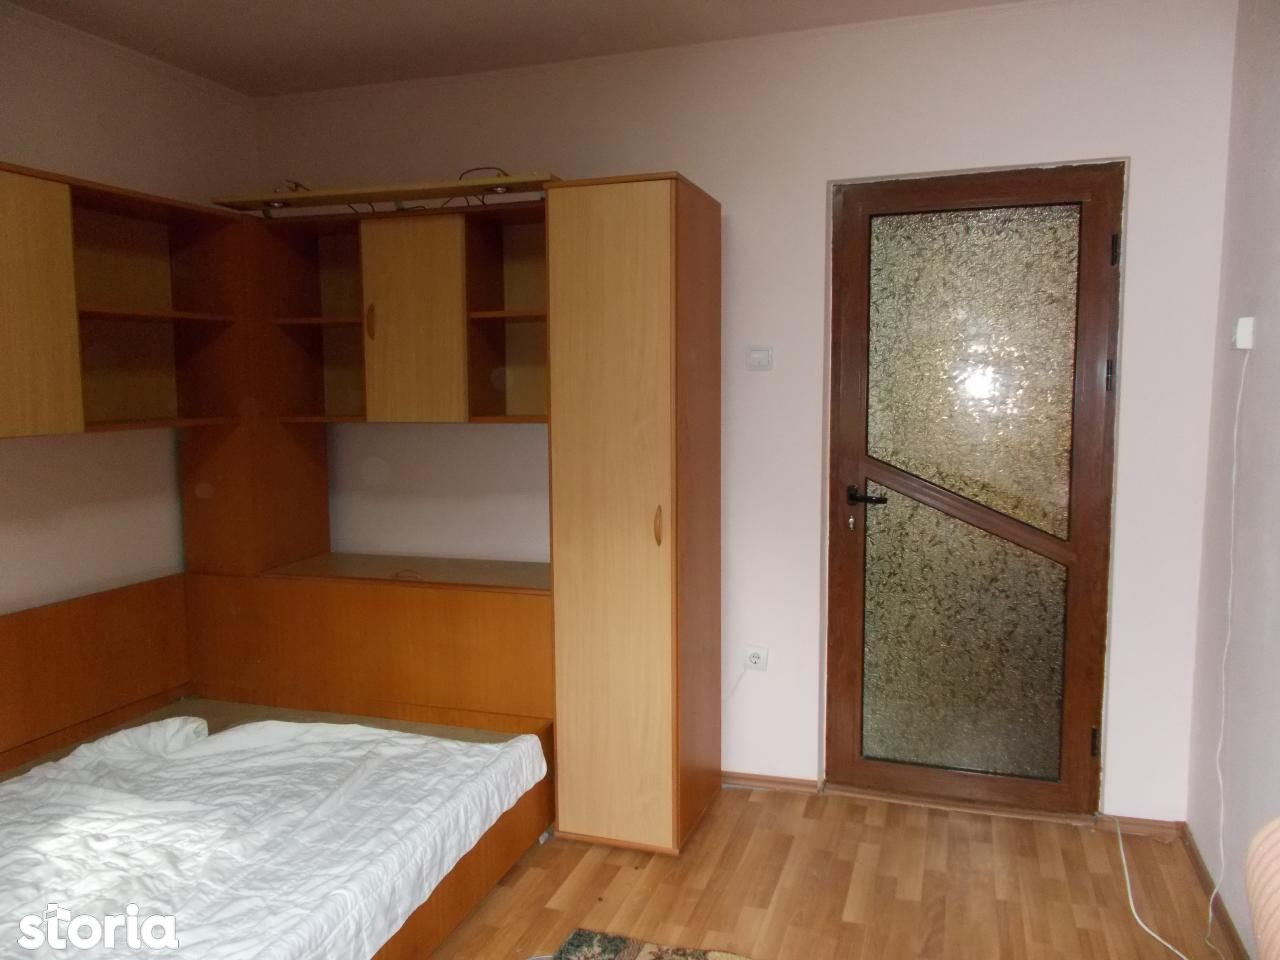 Apartament de vanzare, Braila, Viziru 3 - Foto 3